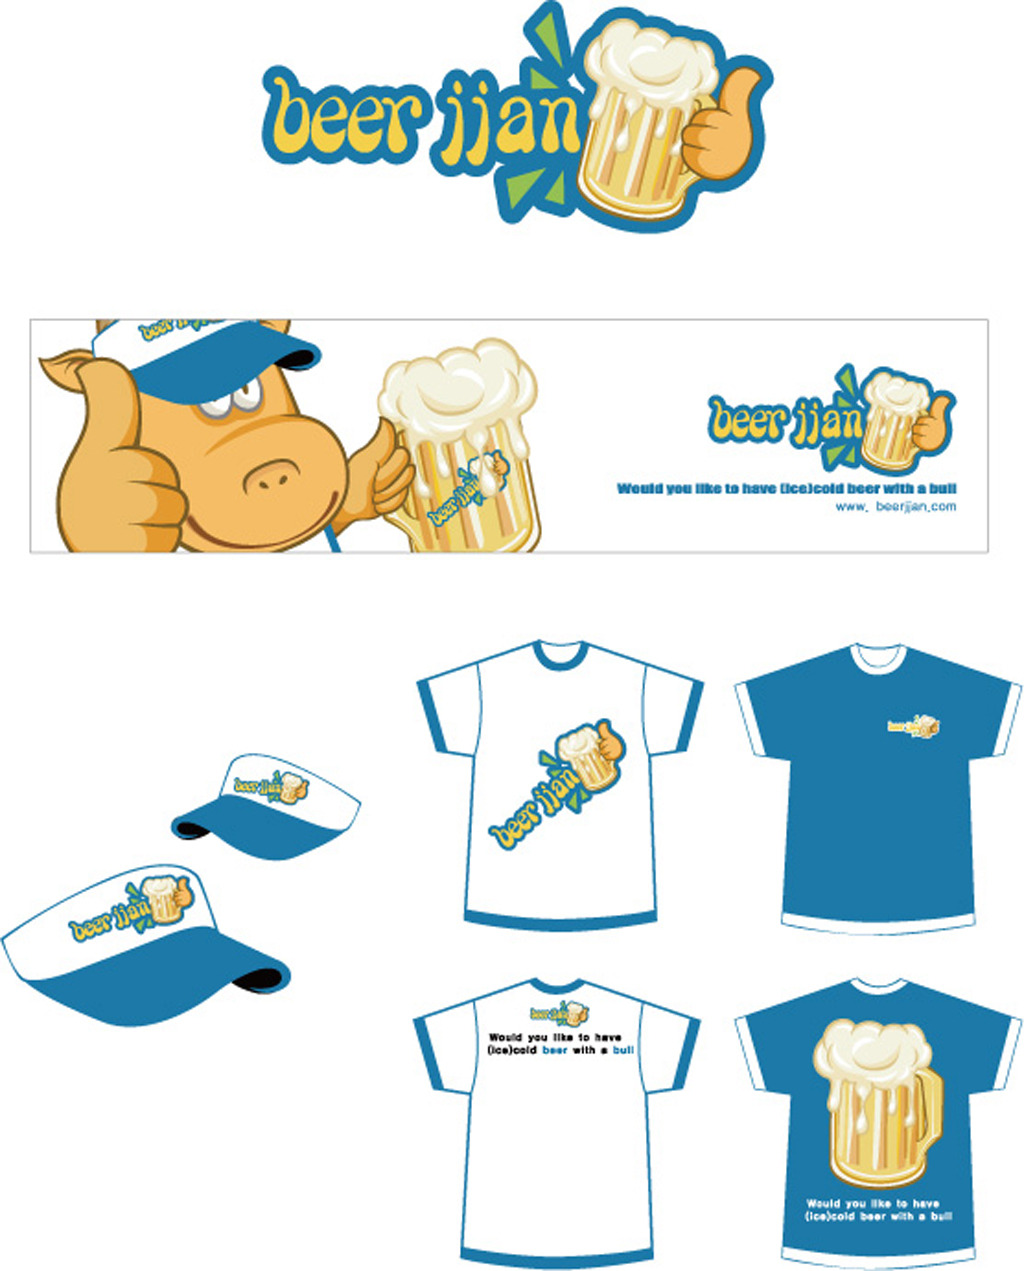 t恤衫设计图片下载 t恤衫设计 t恤衫图案设计 可爱 牛 帽子设计